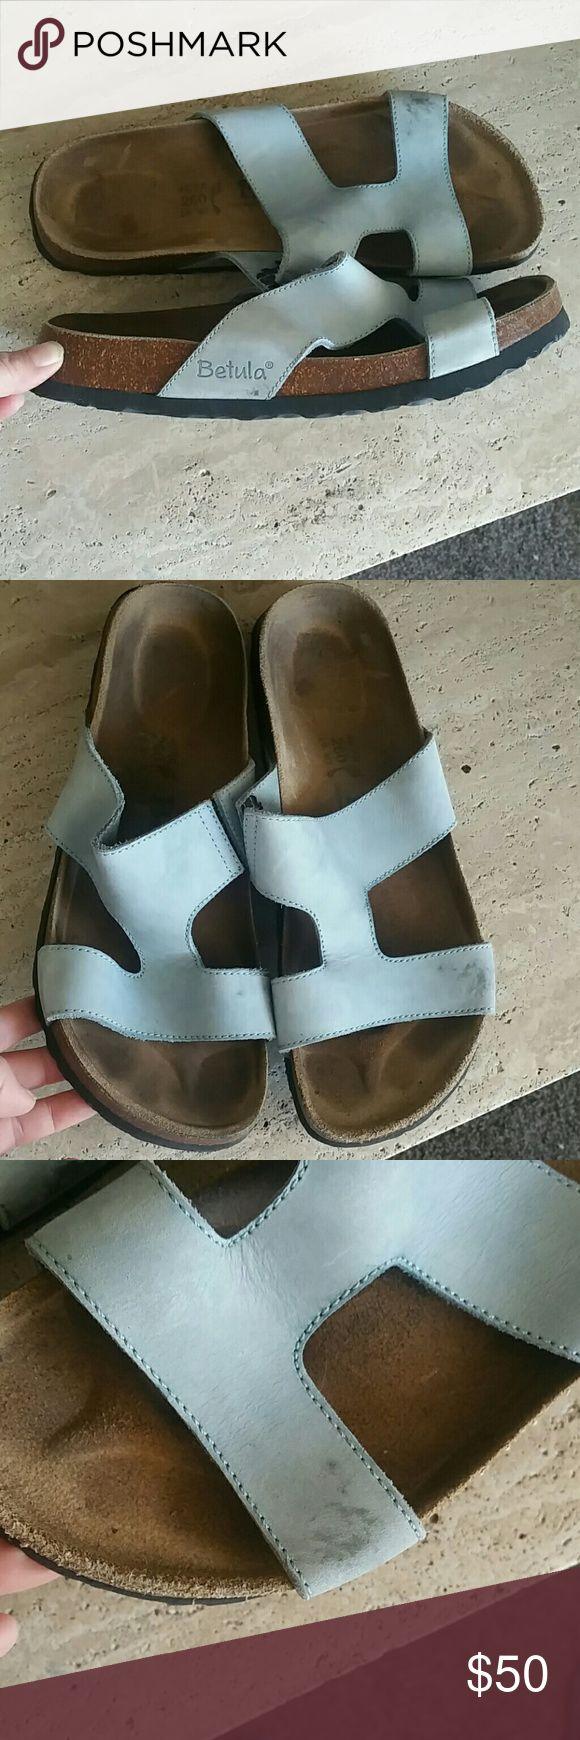 Betula sandals Great condition Birkenstock Shoes Sandals